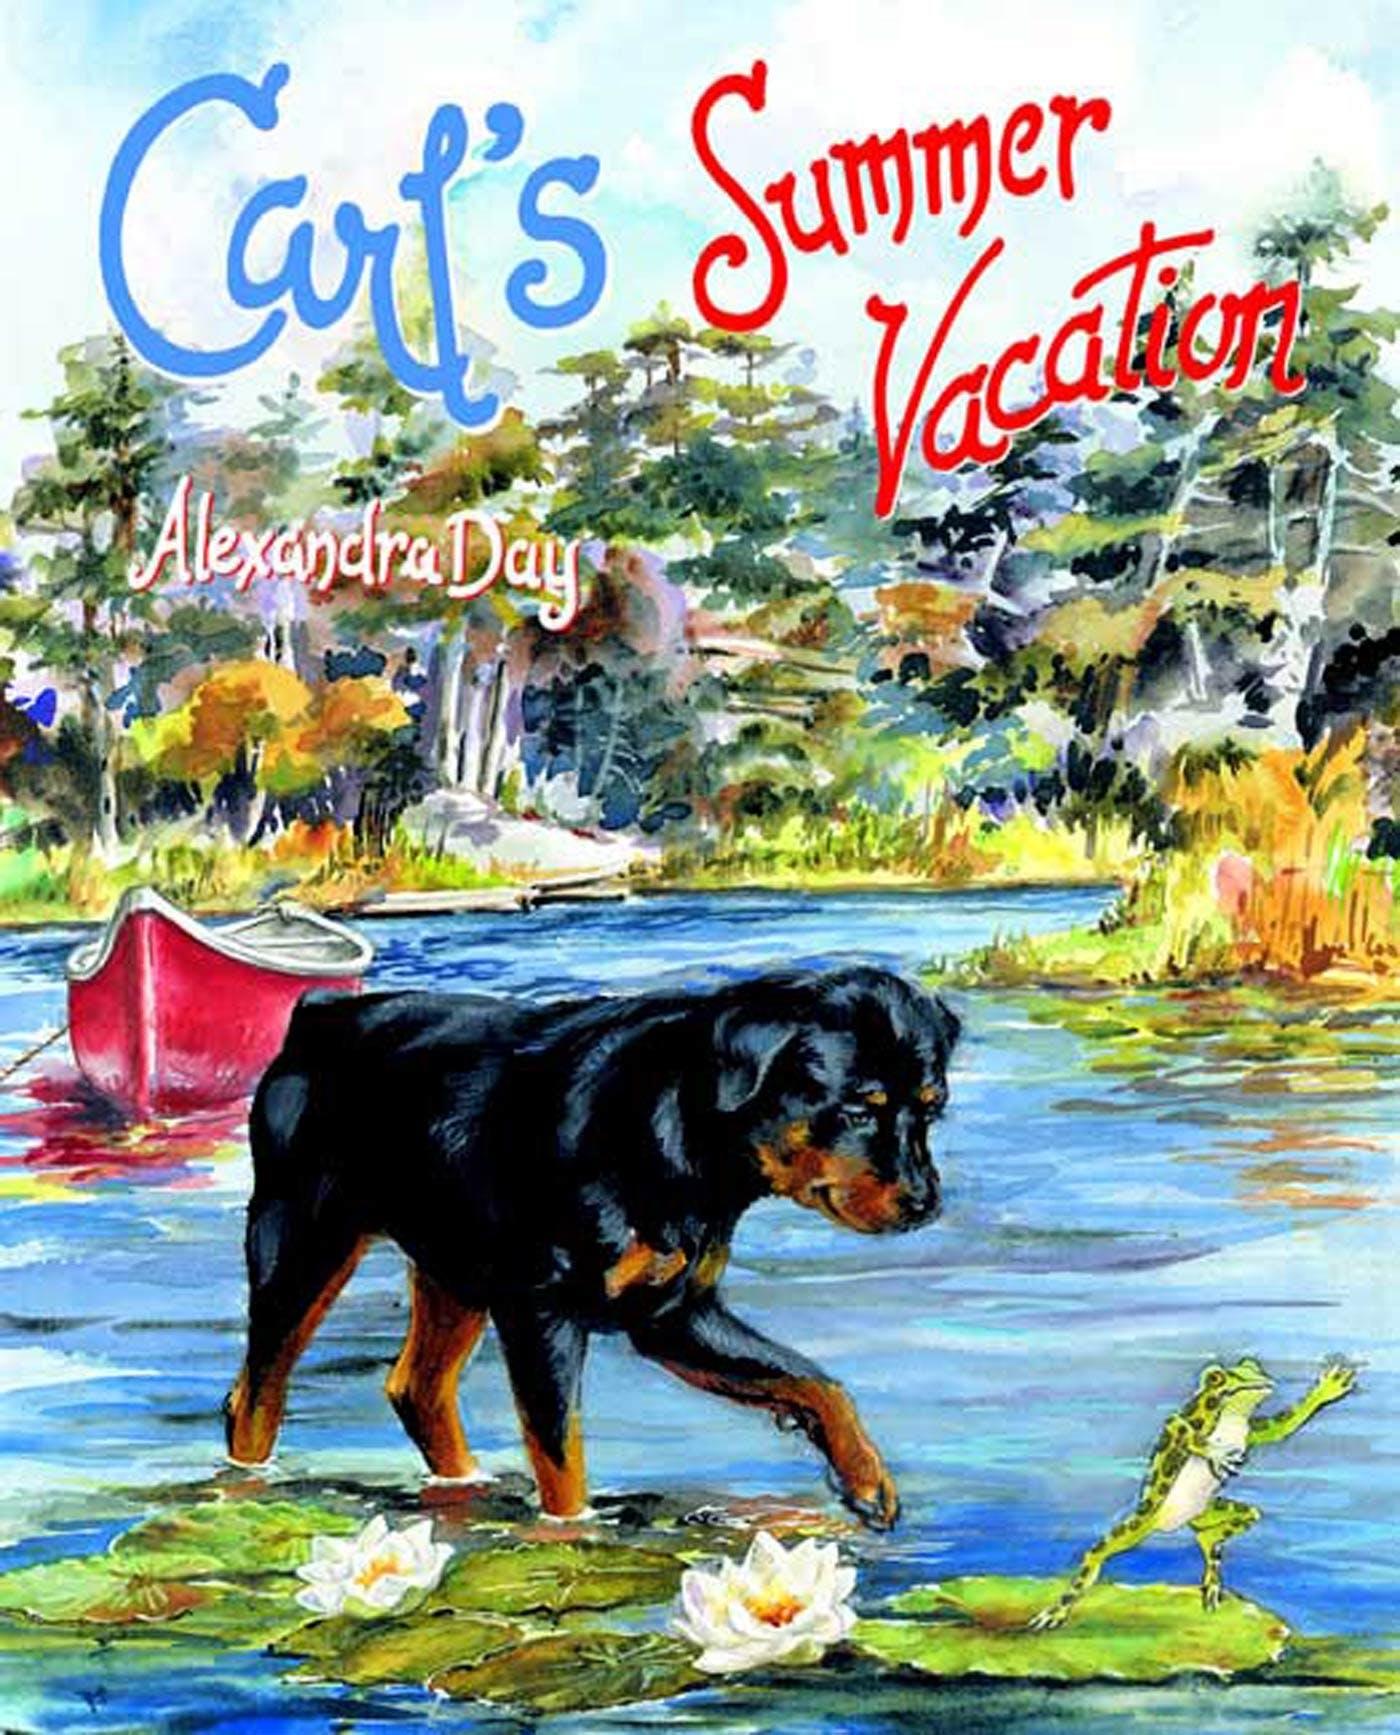 Image of Carl's Summer Vacation